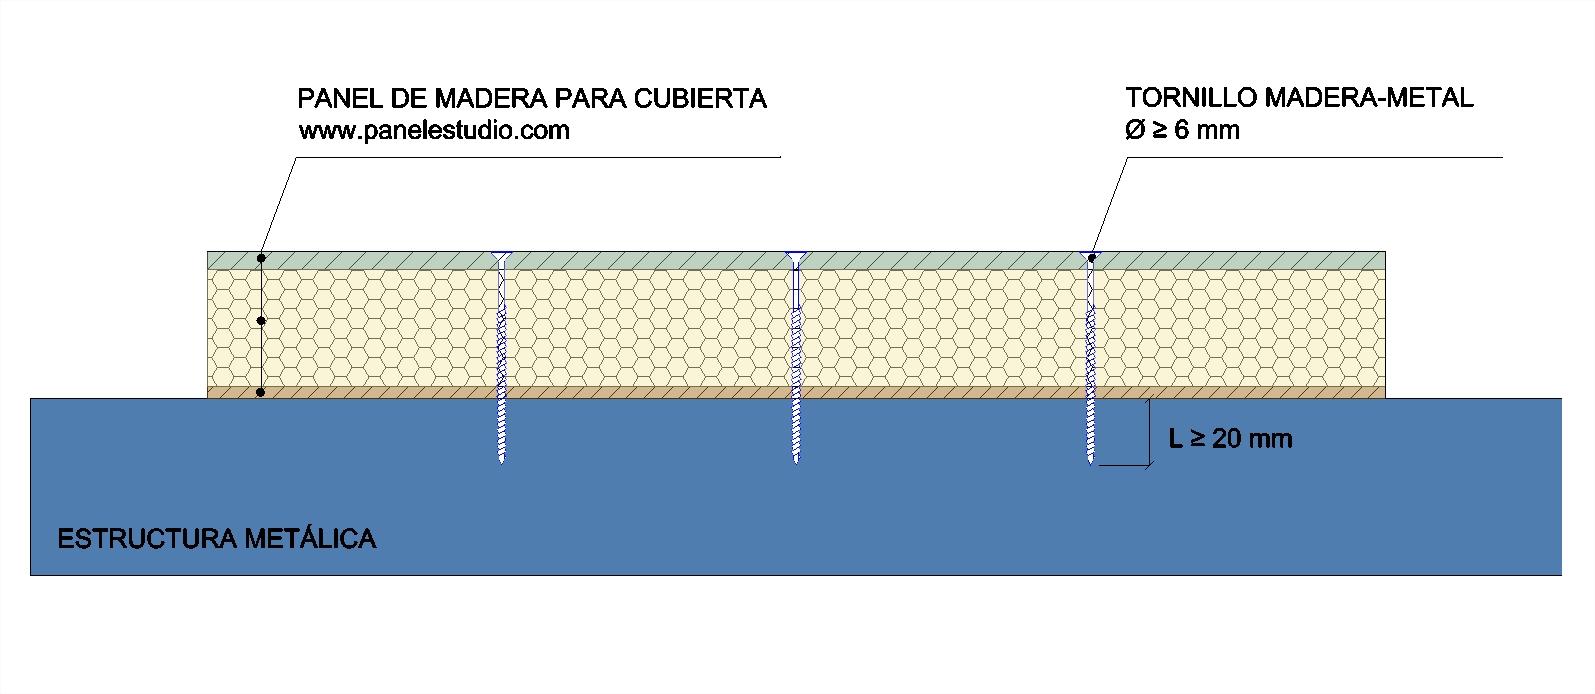 Tornillos para fijar panel de cubierta sobre estructura metálica. www.panelestudio.com